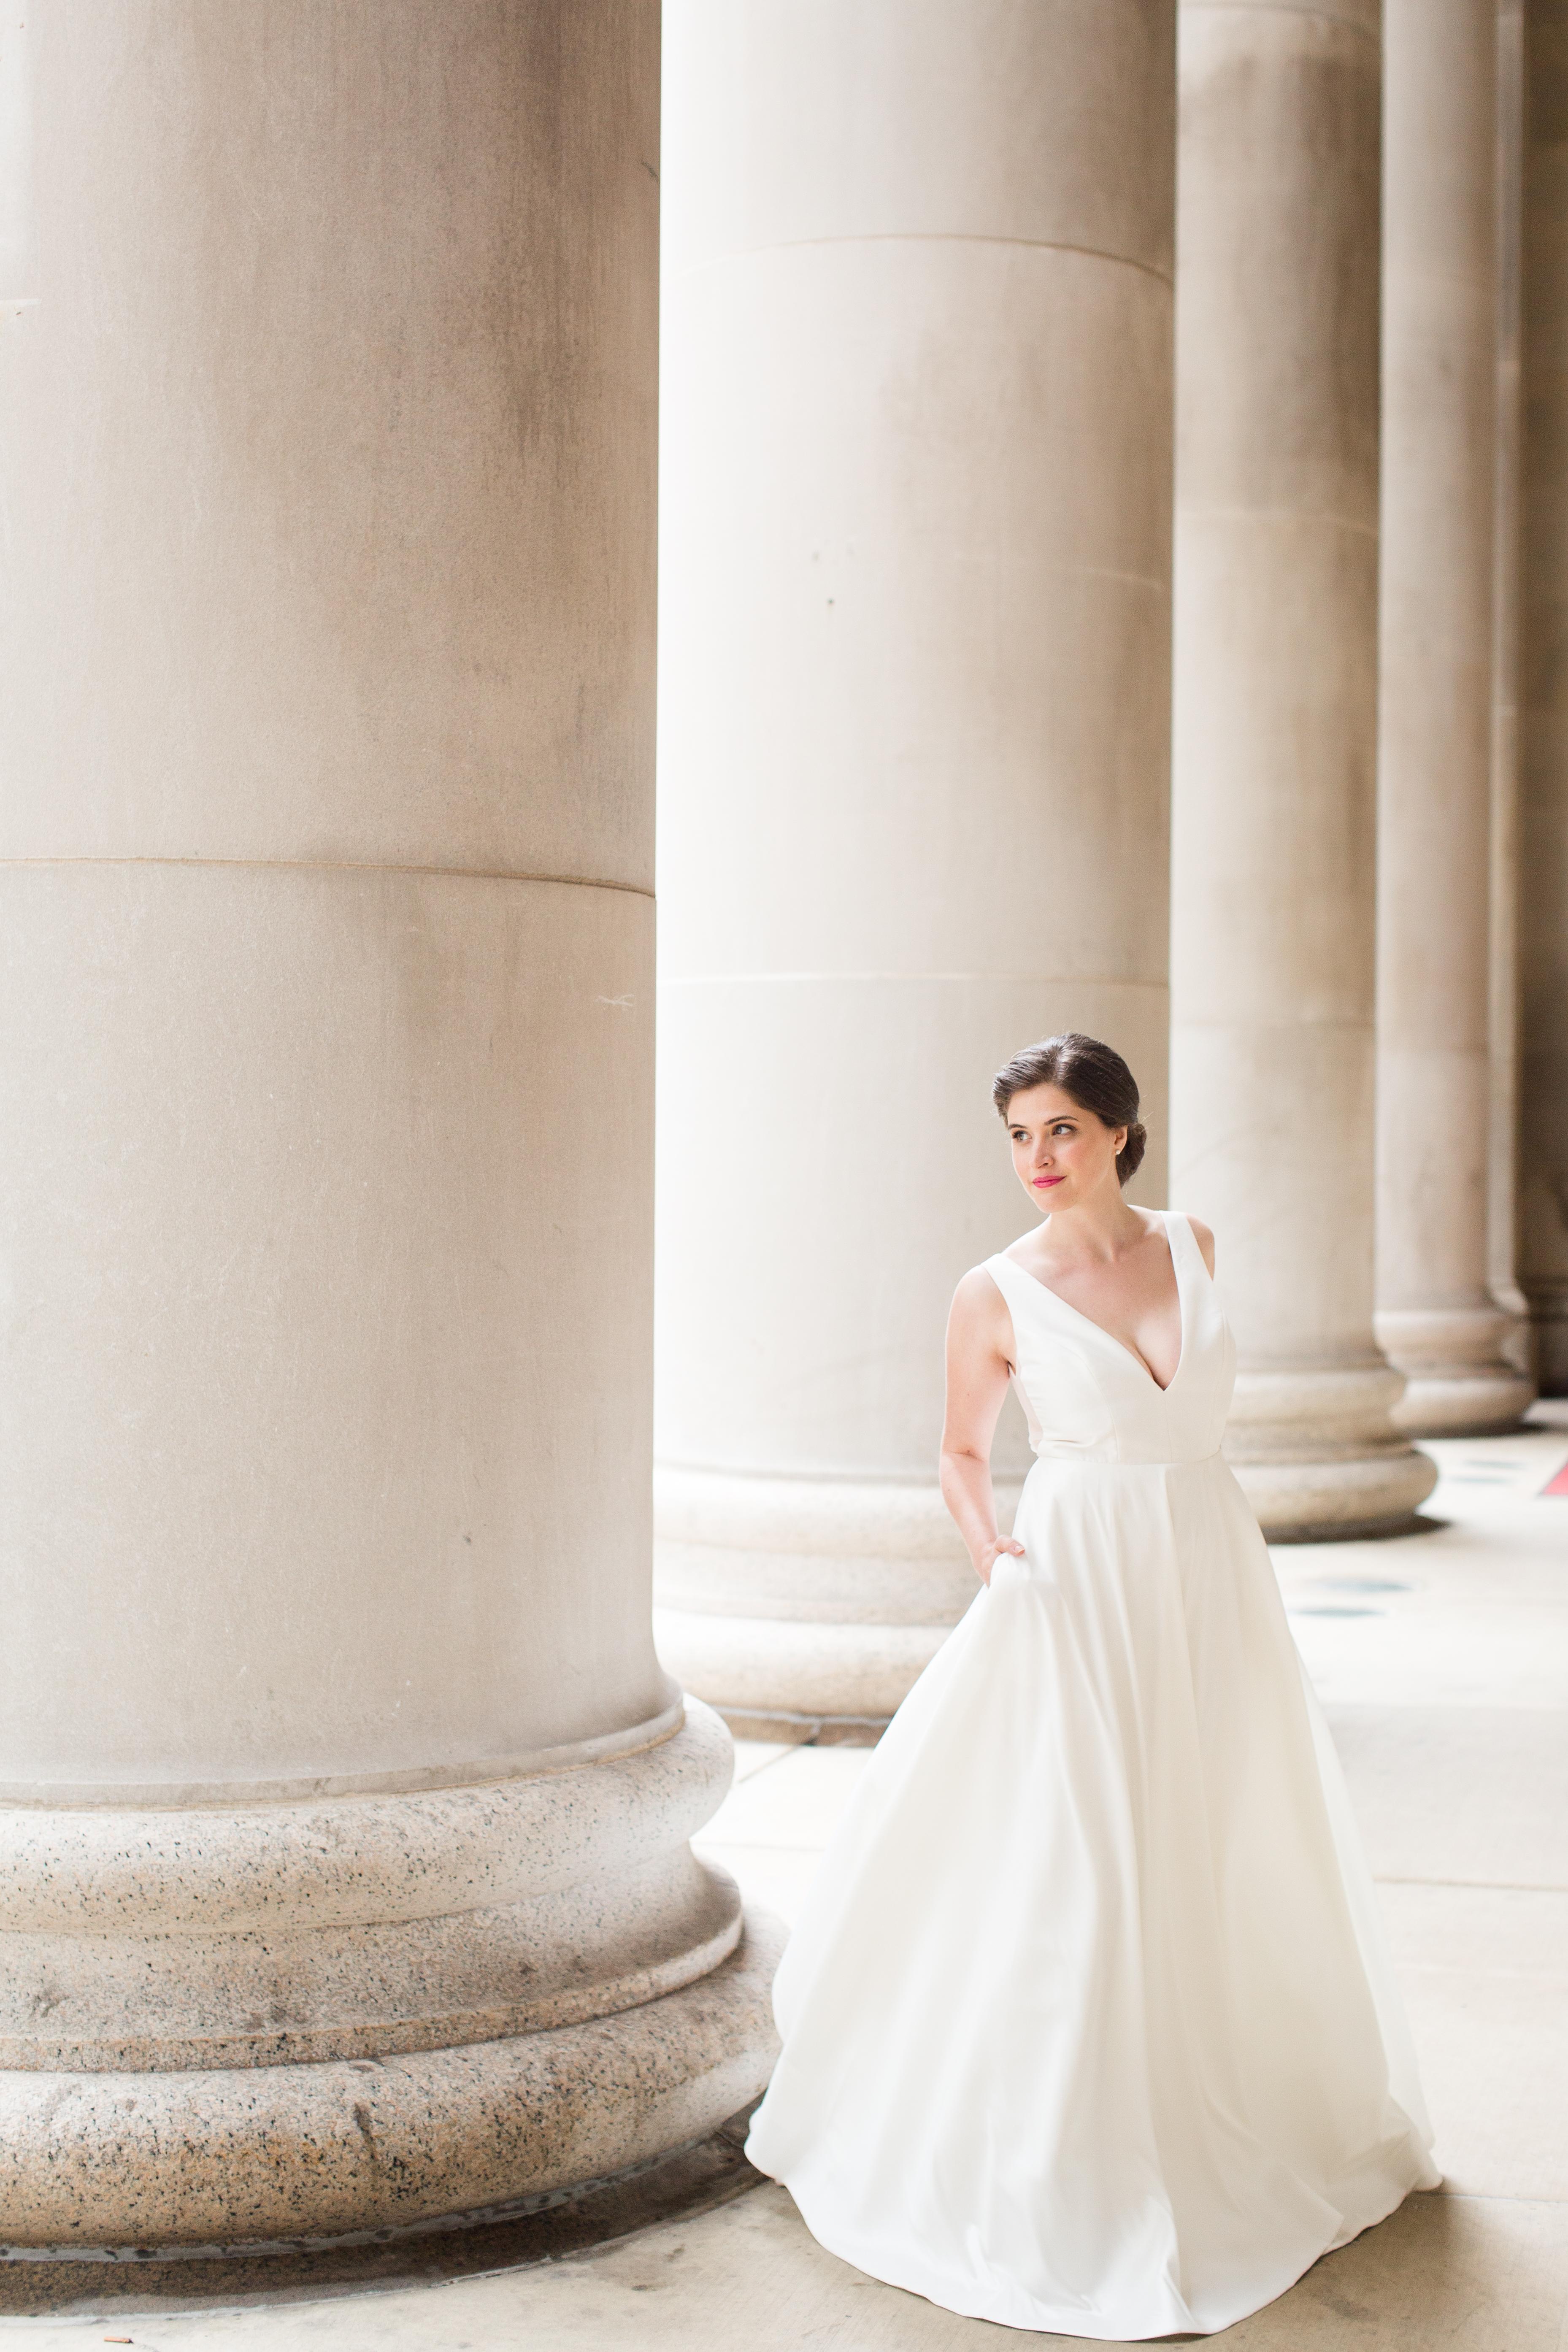 union-station-bride-groom-alexandra-lee-photography-63